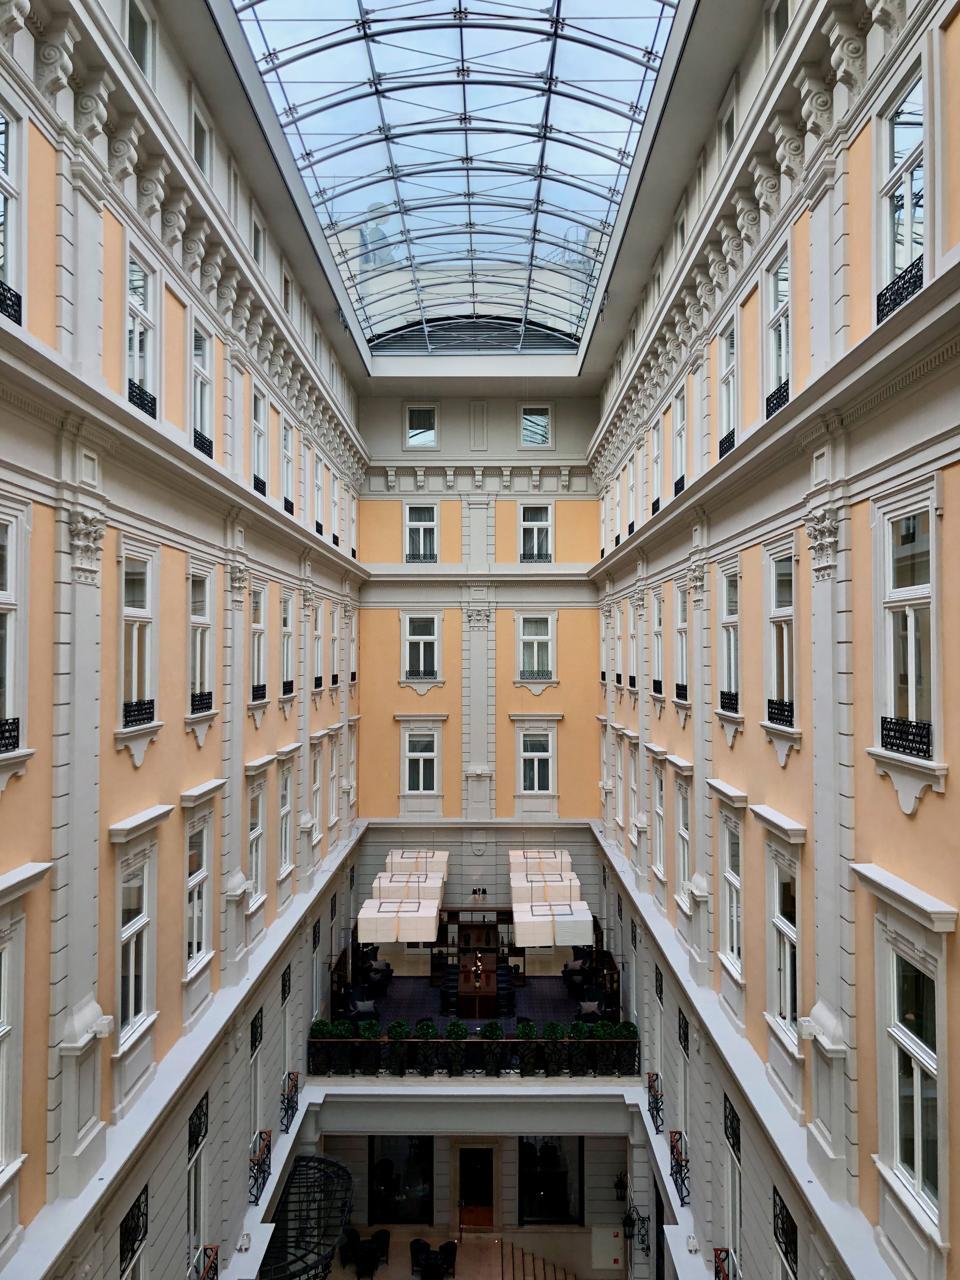 The Corinthia Hotel Budapest atrium view.